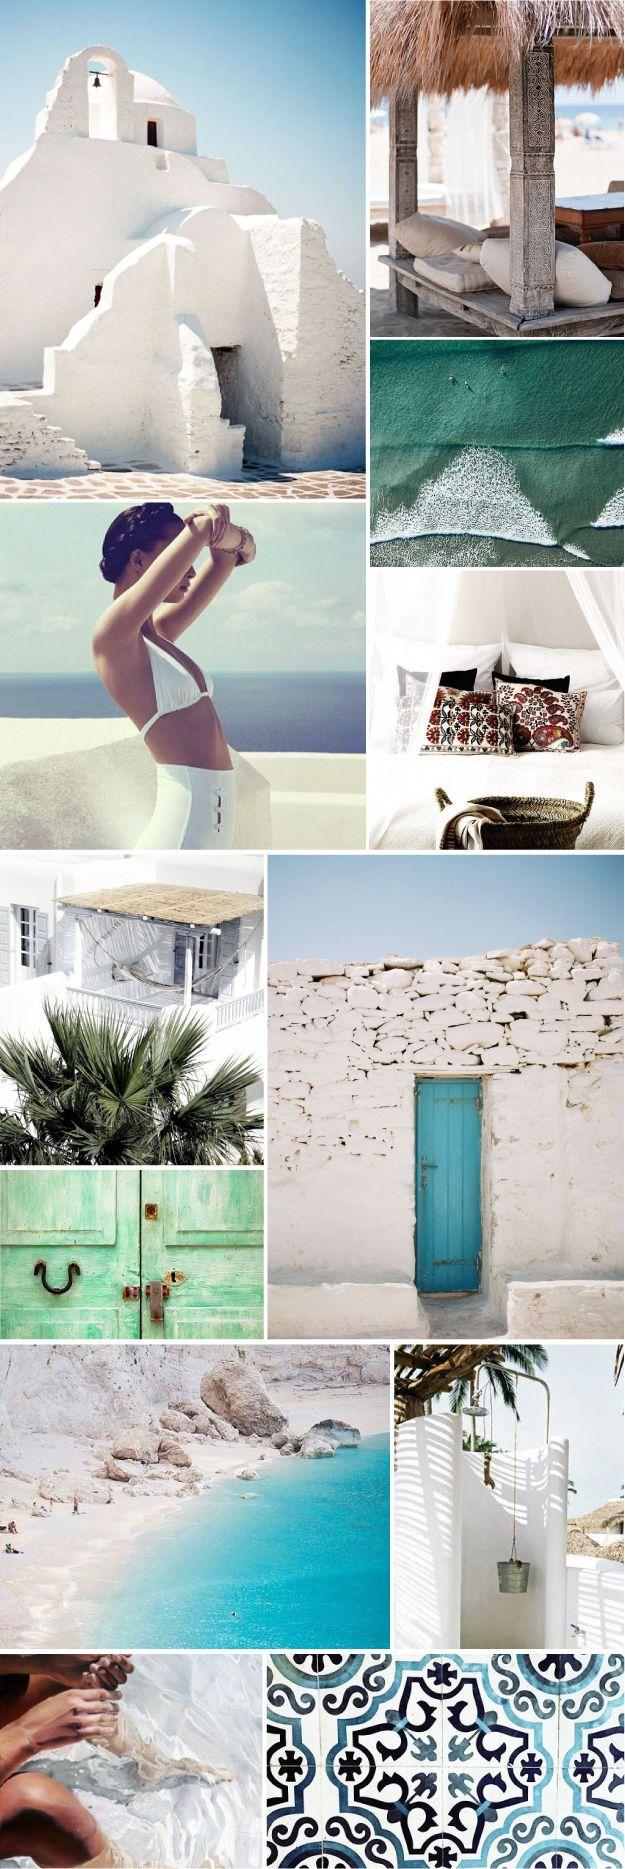 designsocial_moodboard_islandhopping